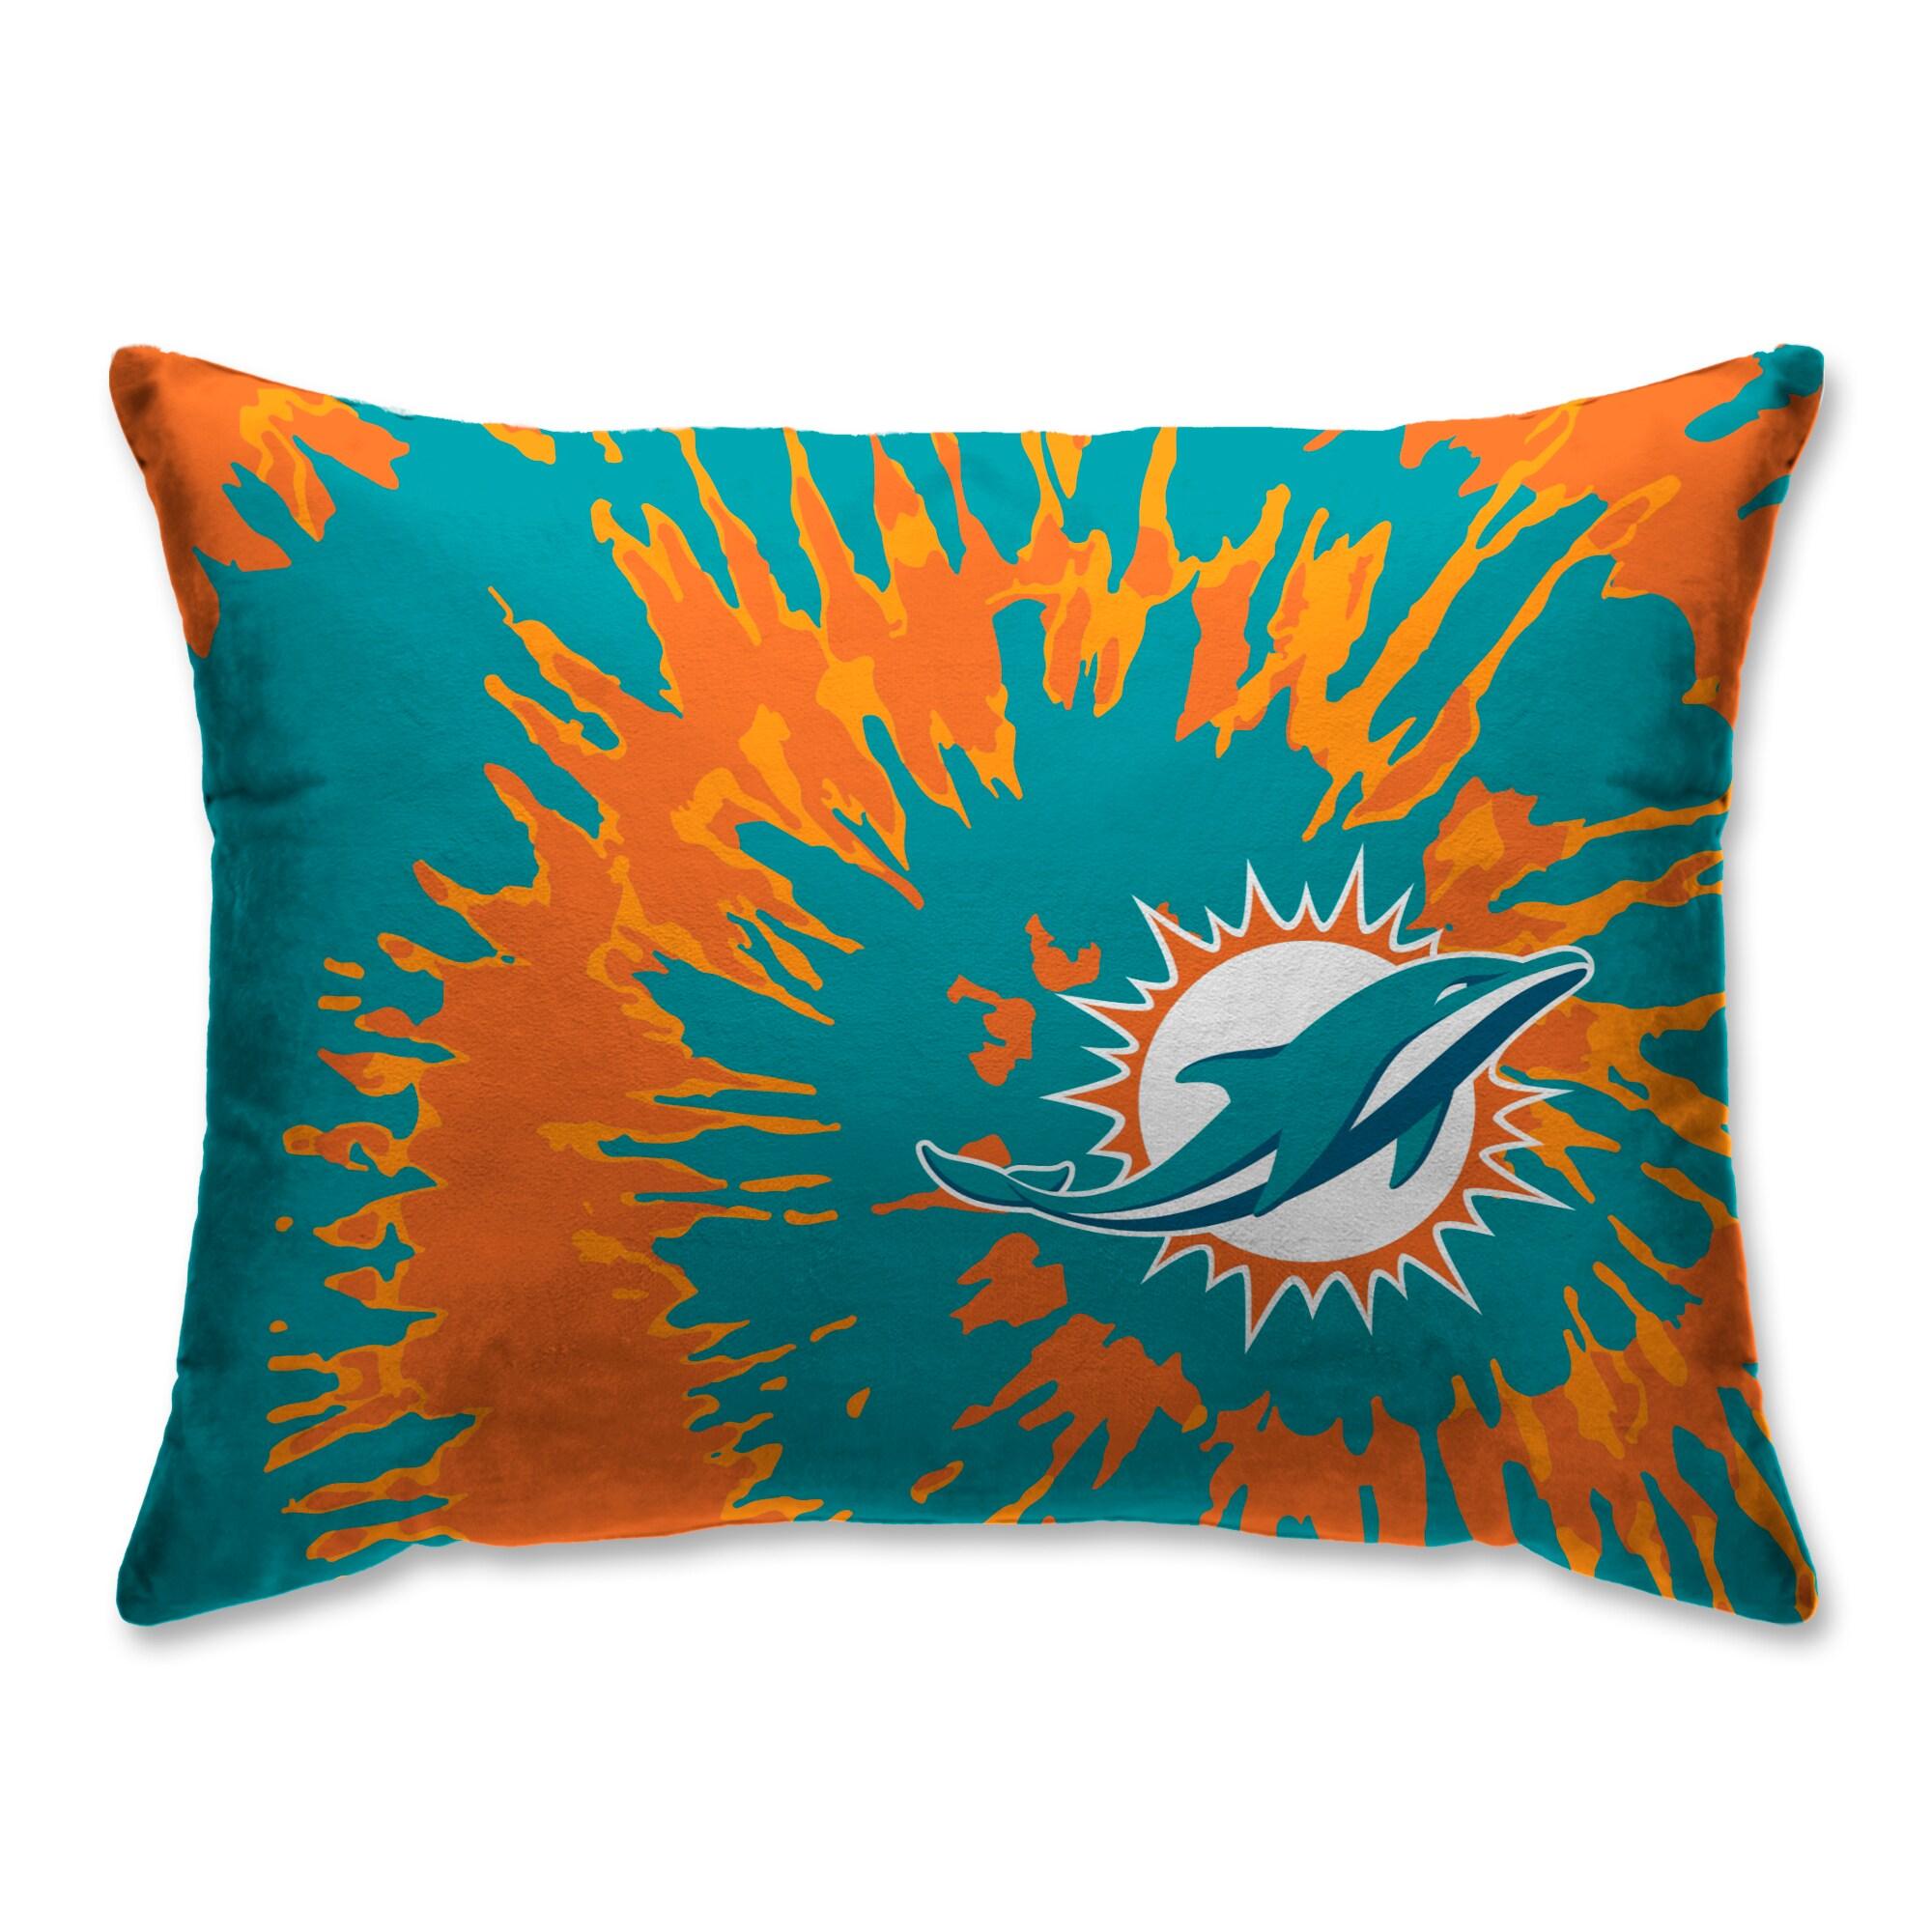 Miami Dolphins Tie Dye Plush Bed Pillow - Teal